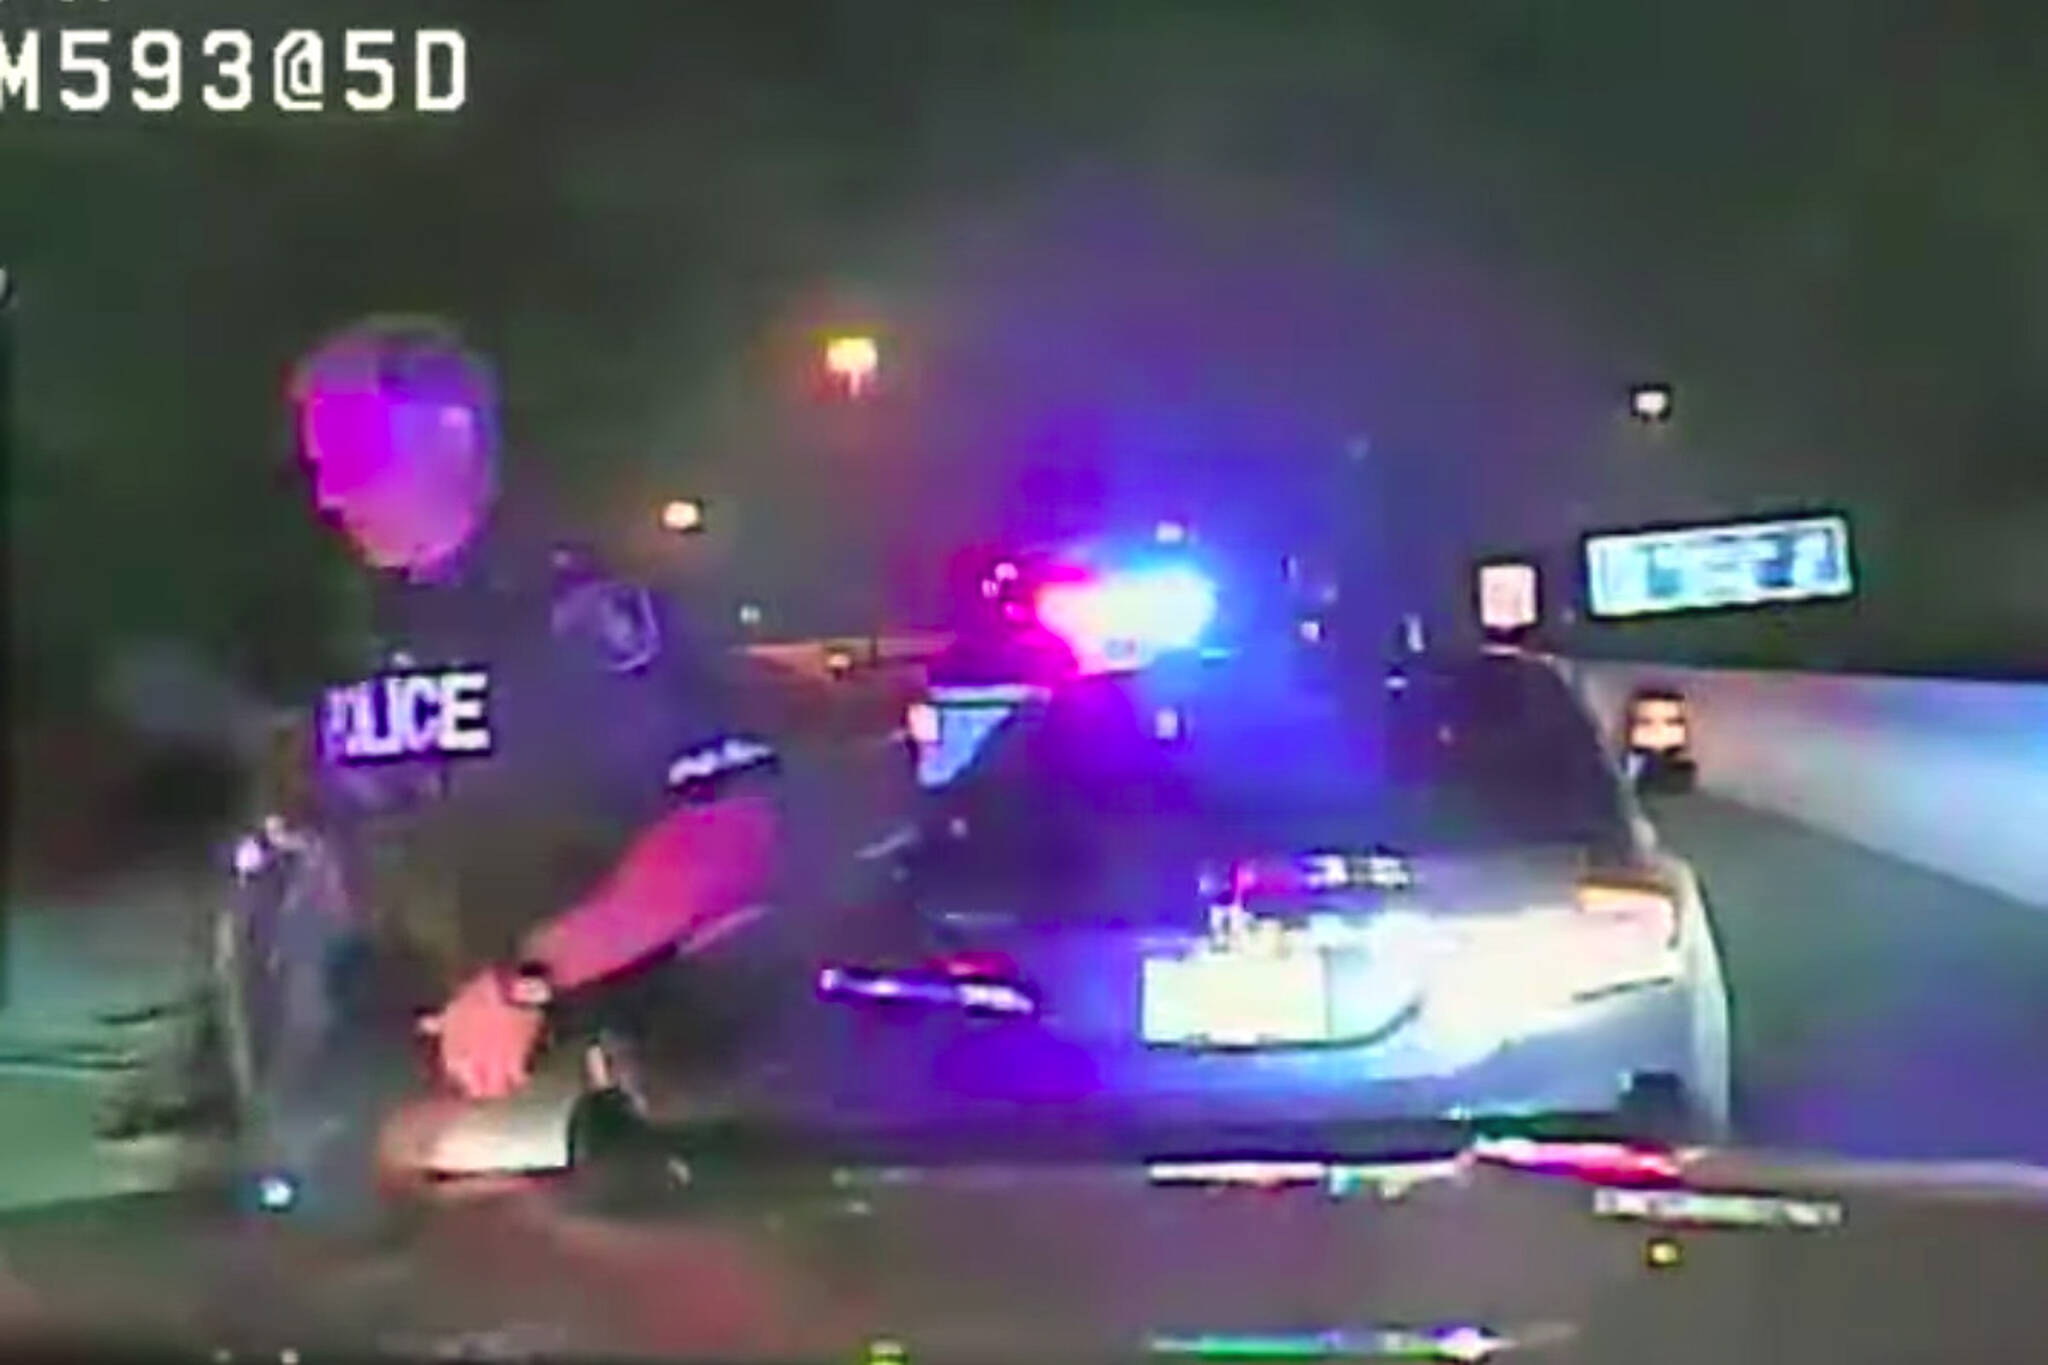 toronto highway video